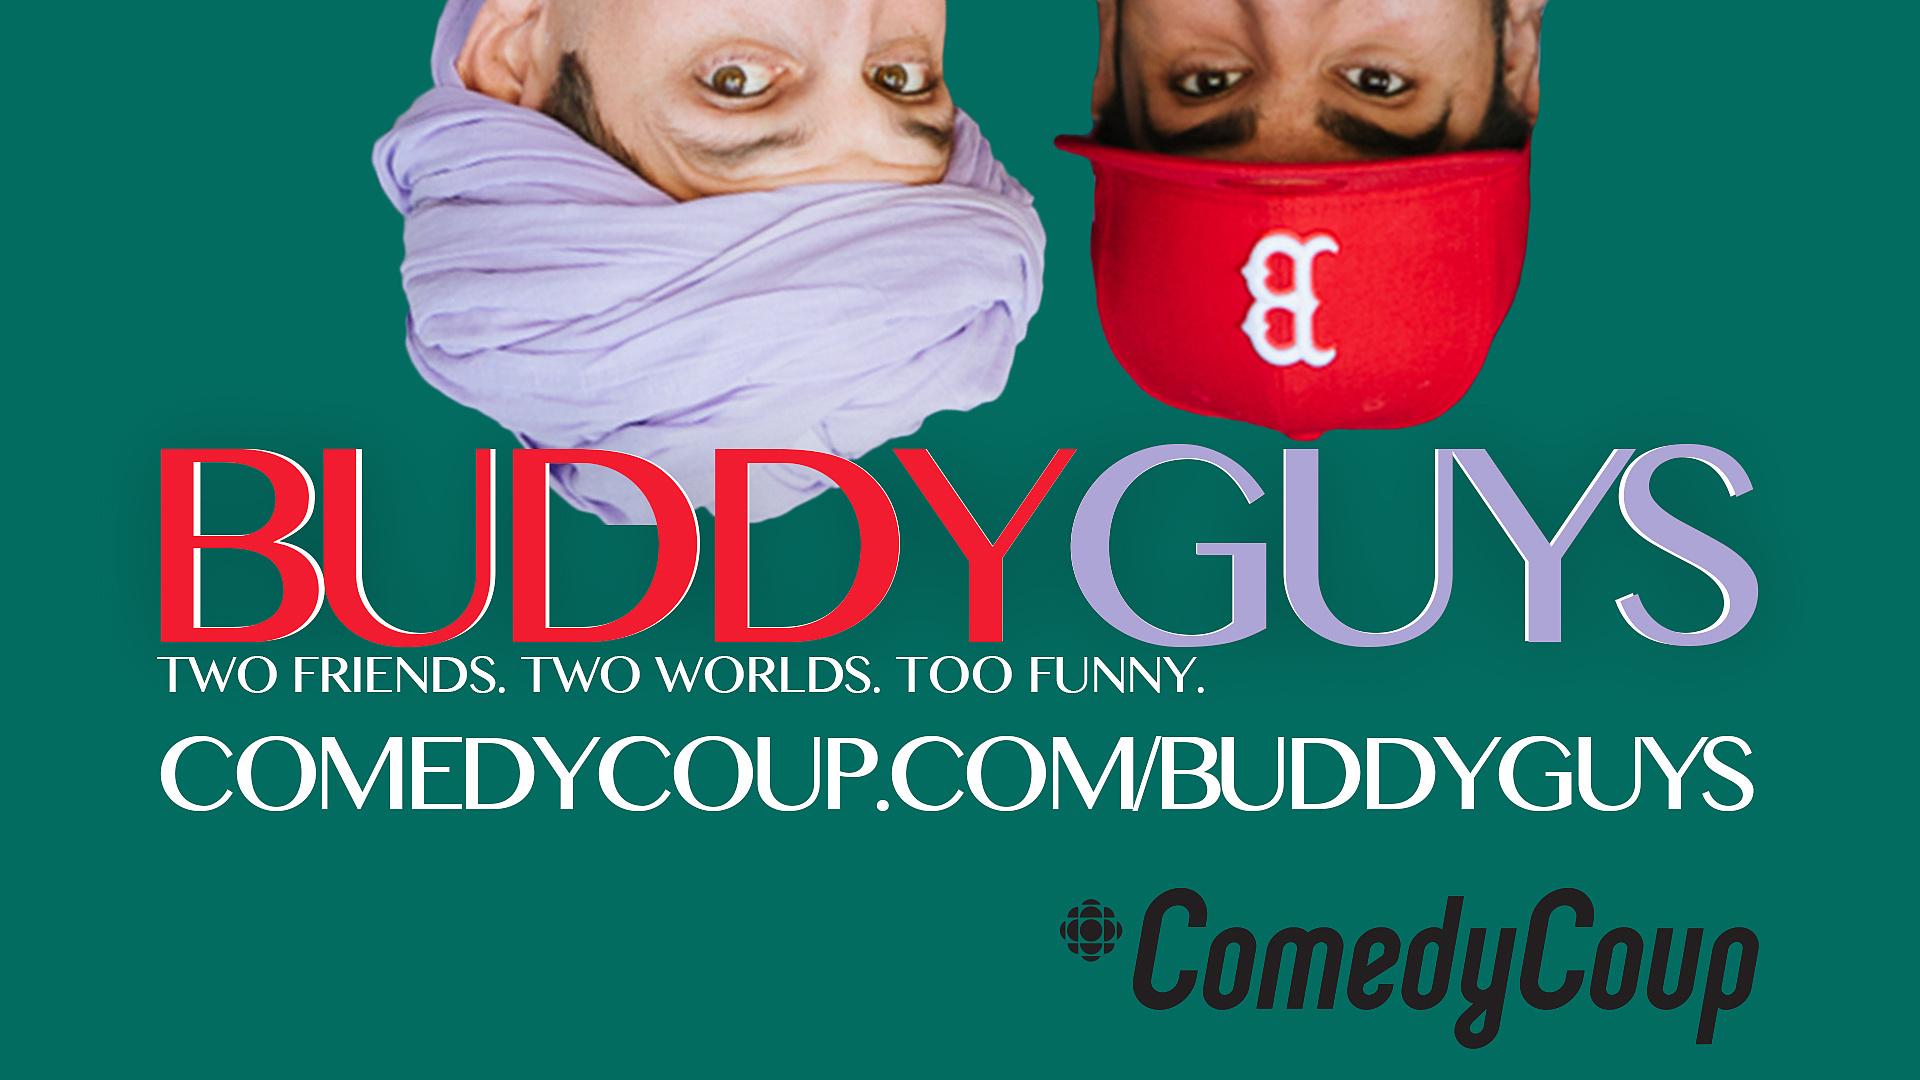 Week 4 Key It: Poster B Buddy Guys